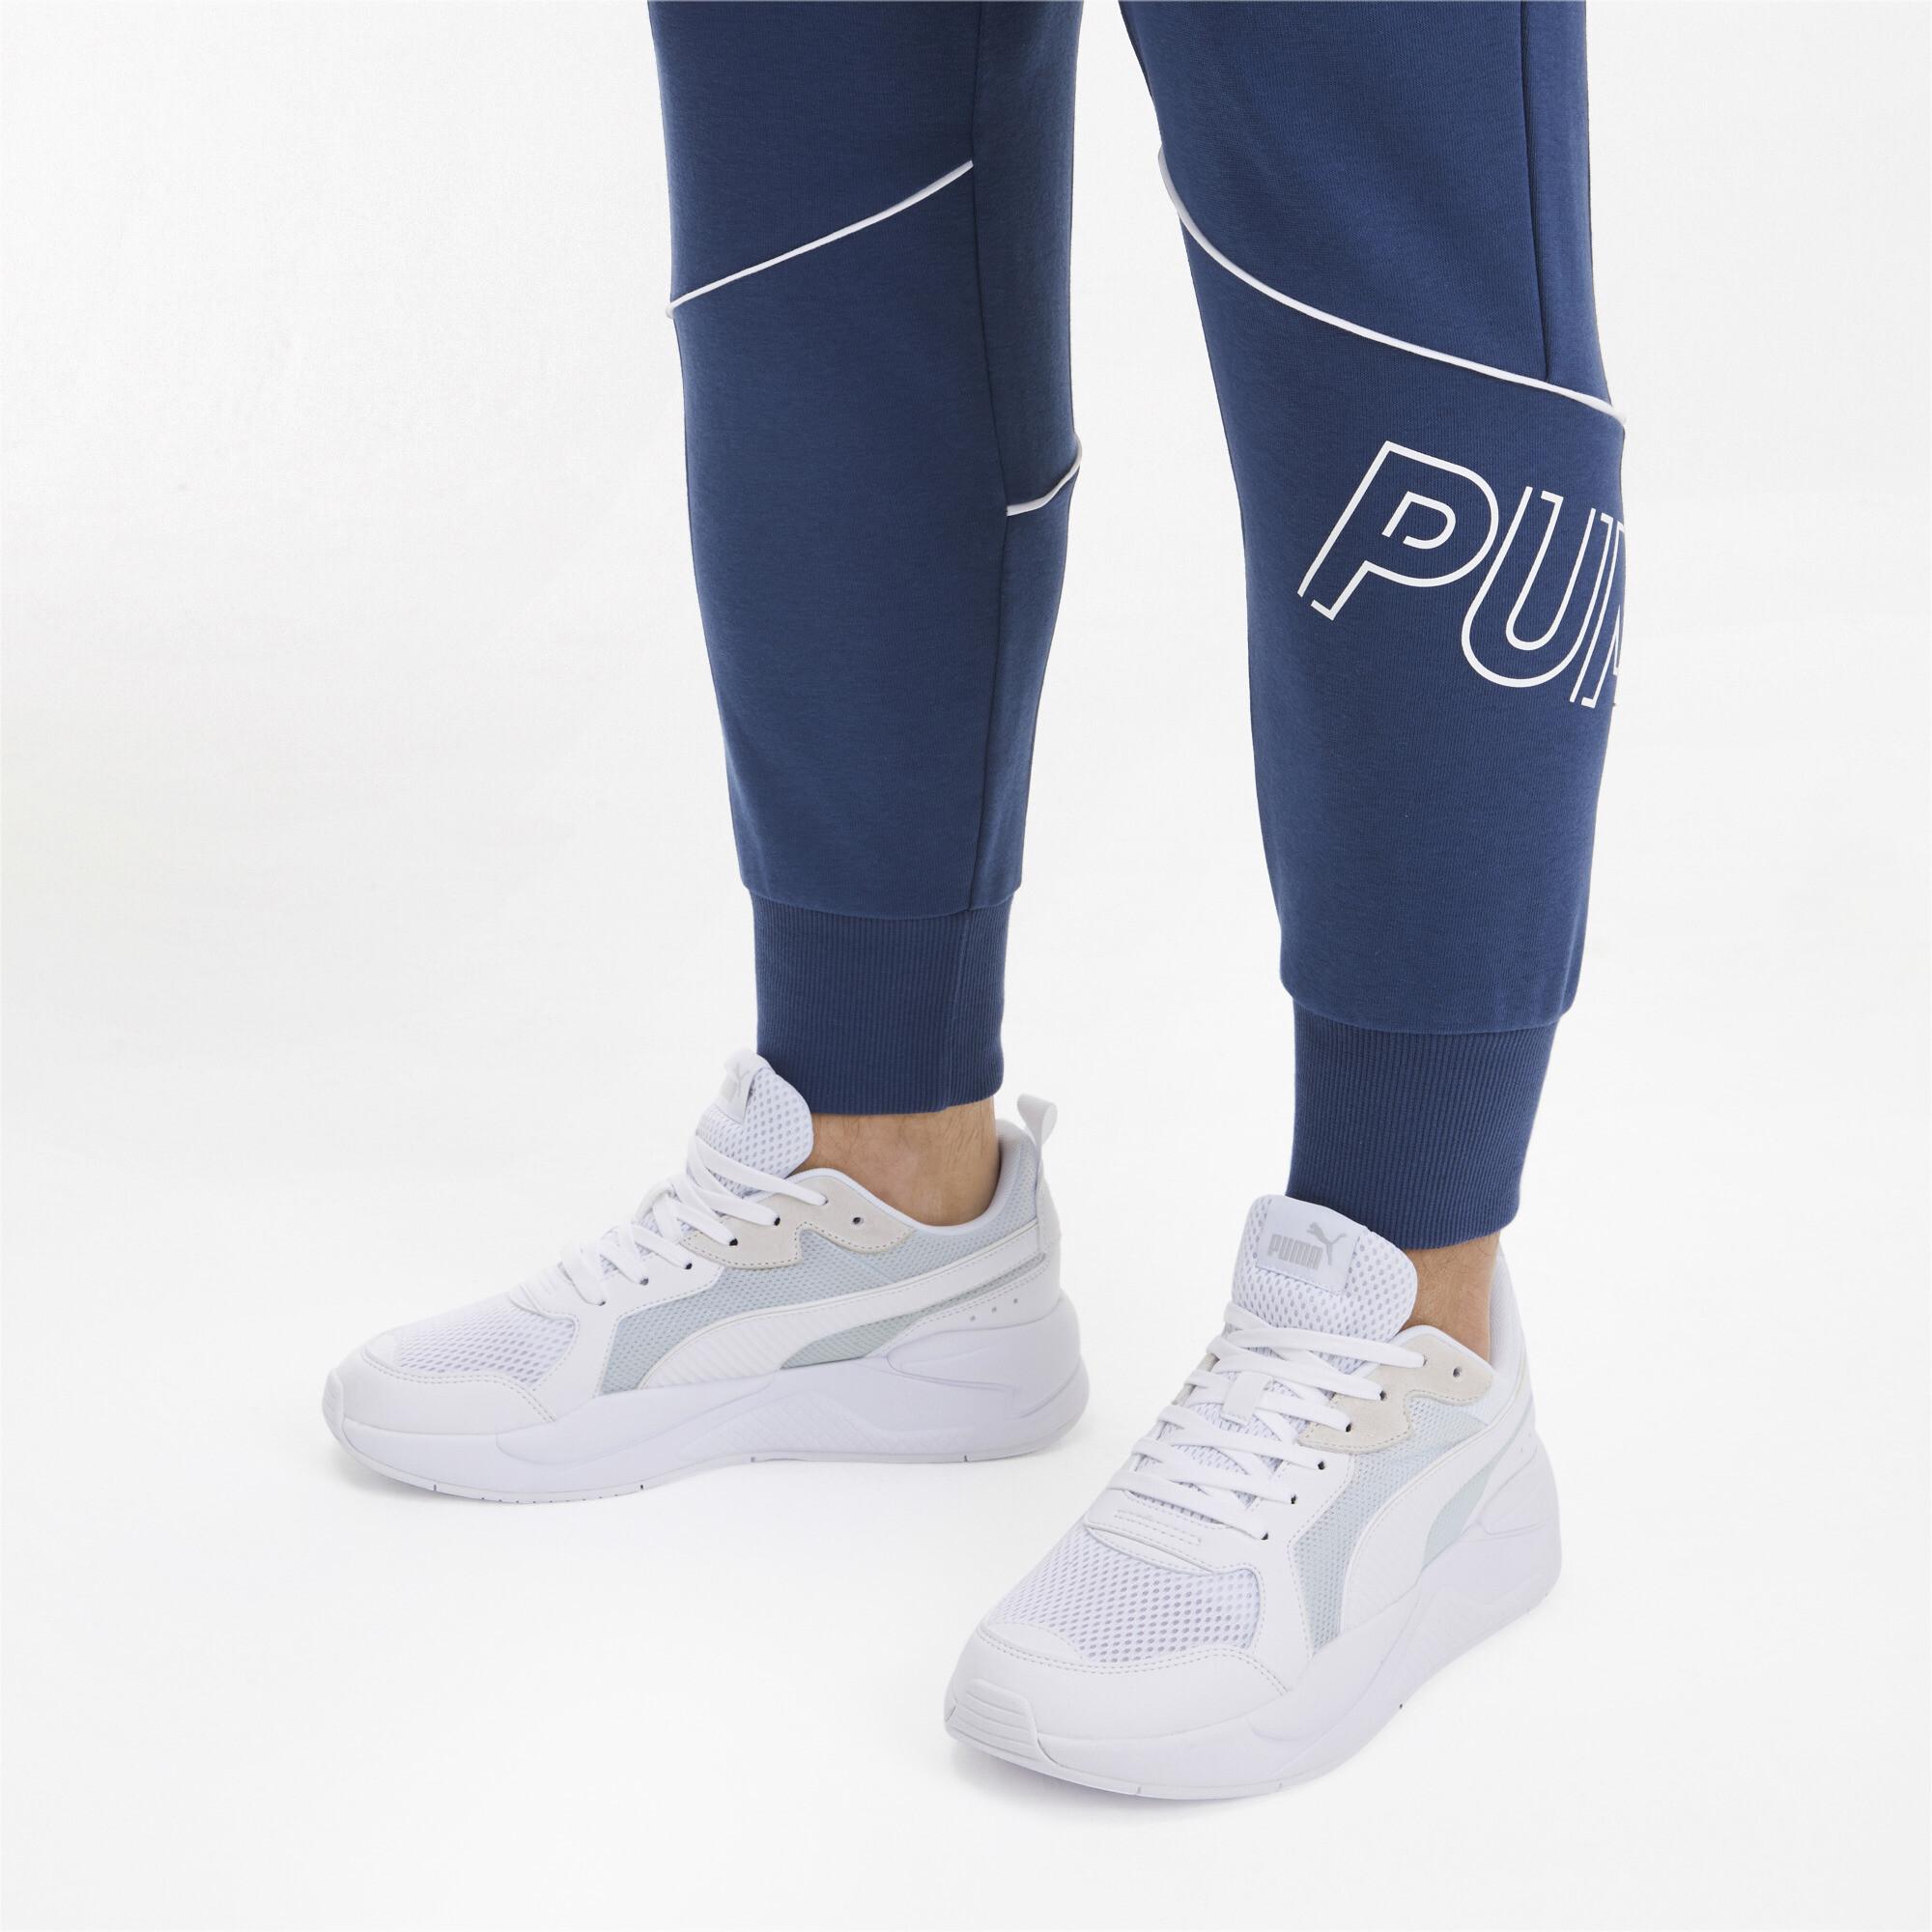 PUMA-Men-039-s-X-RAY-Sneakers thumbnail 26